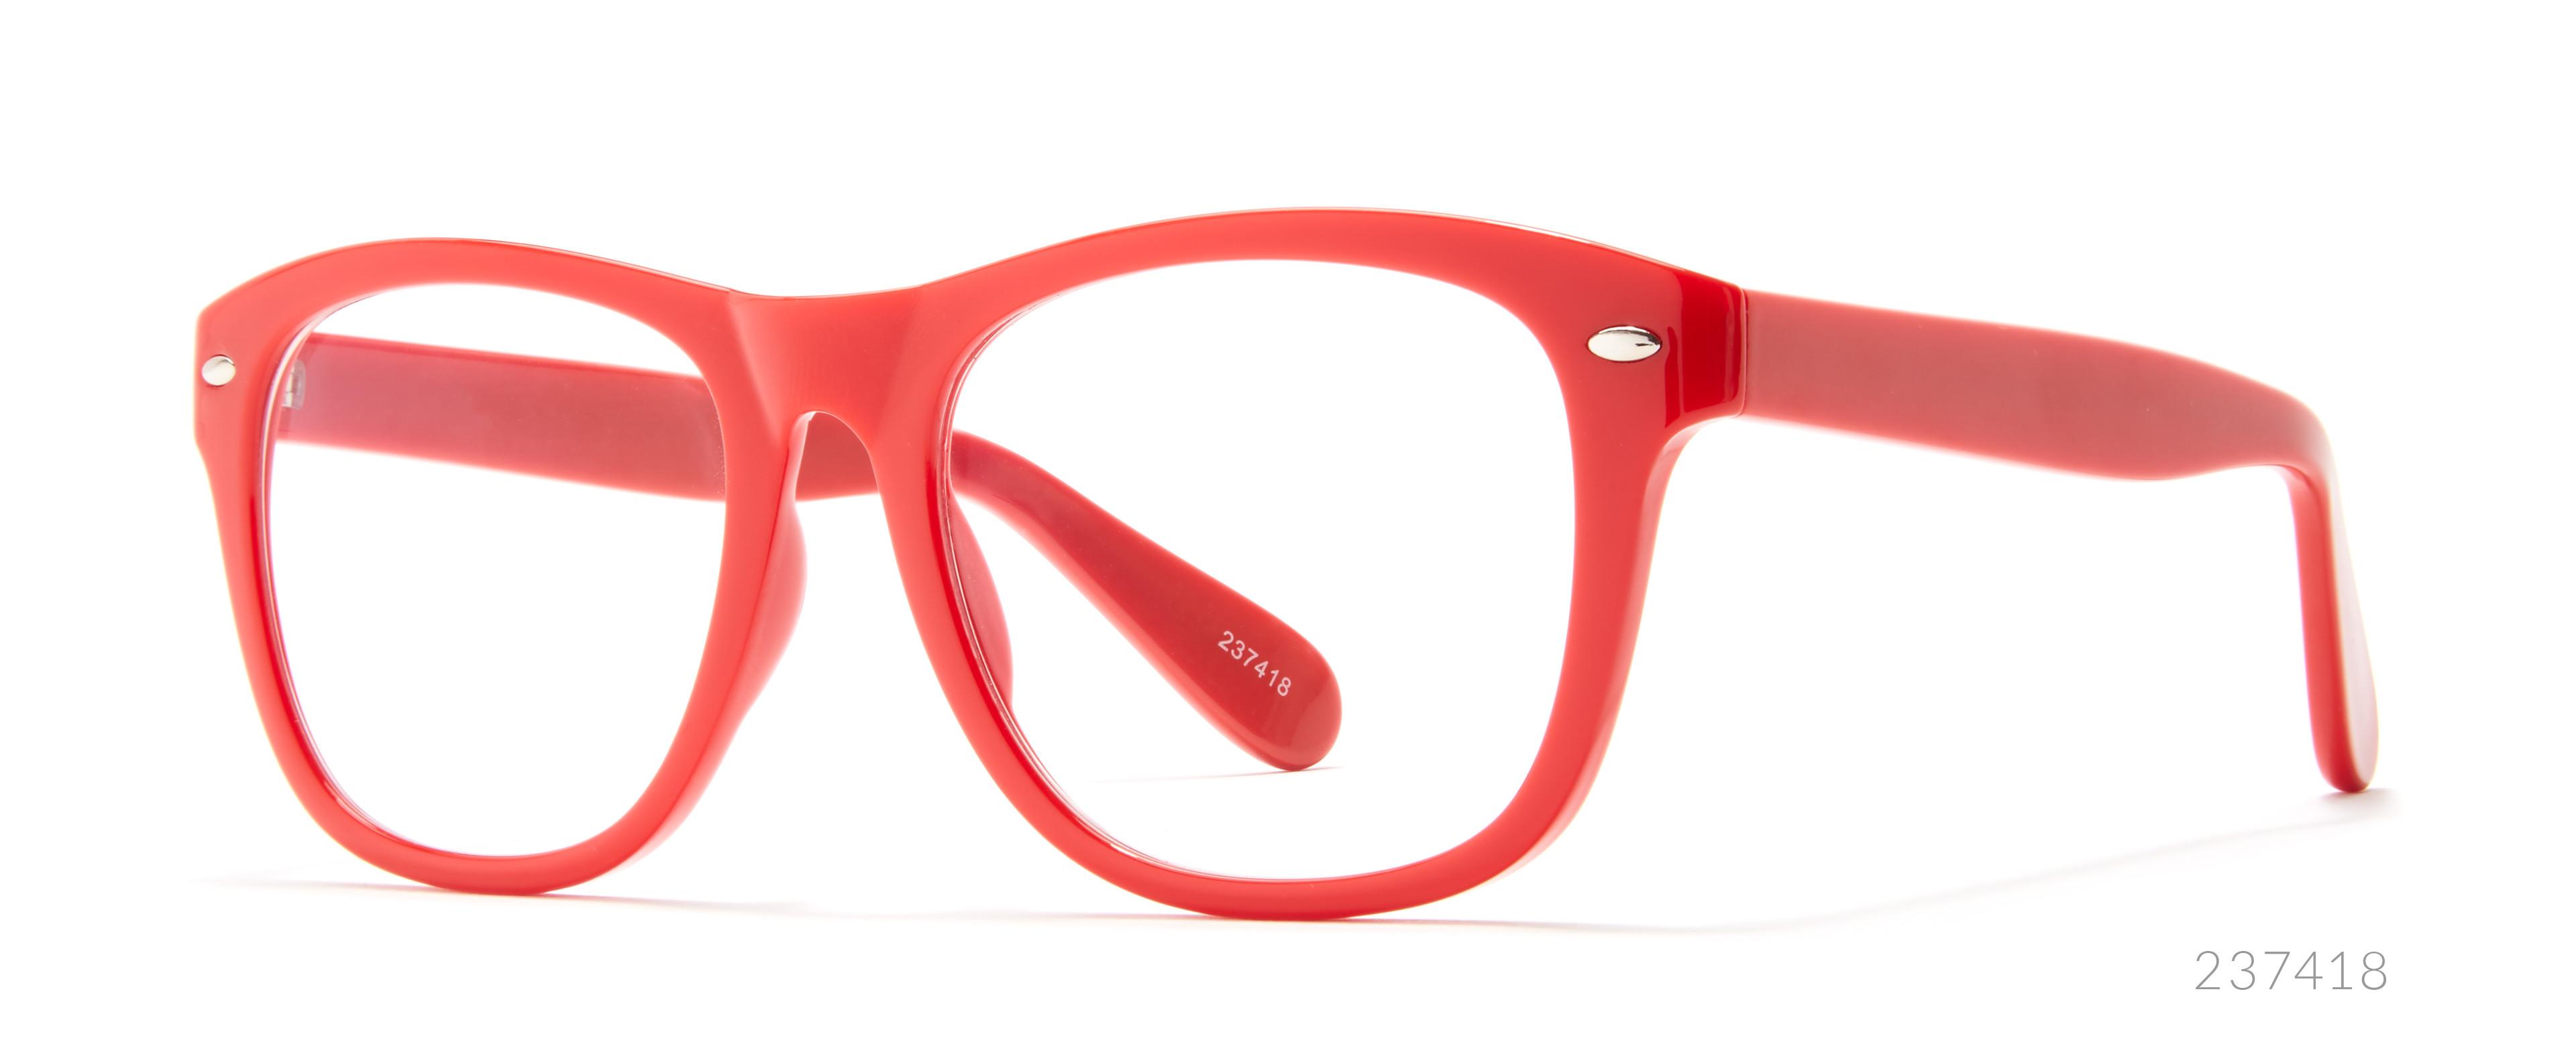 red wedding glasses